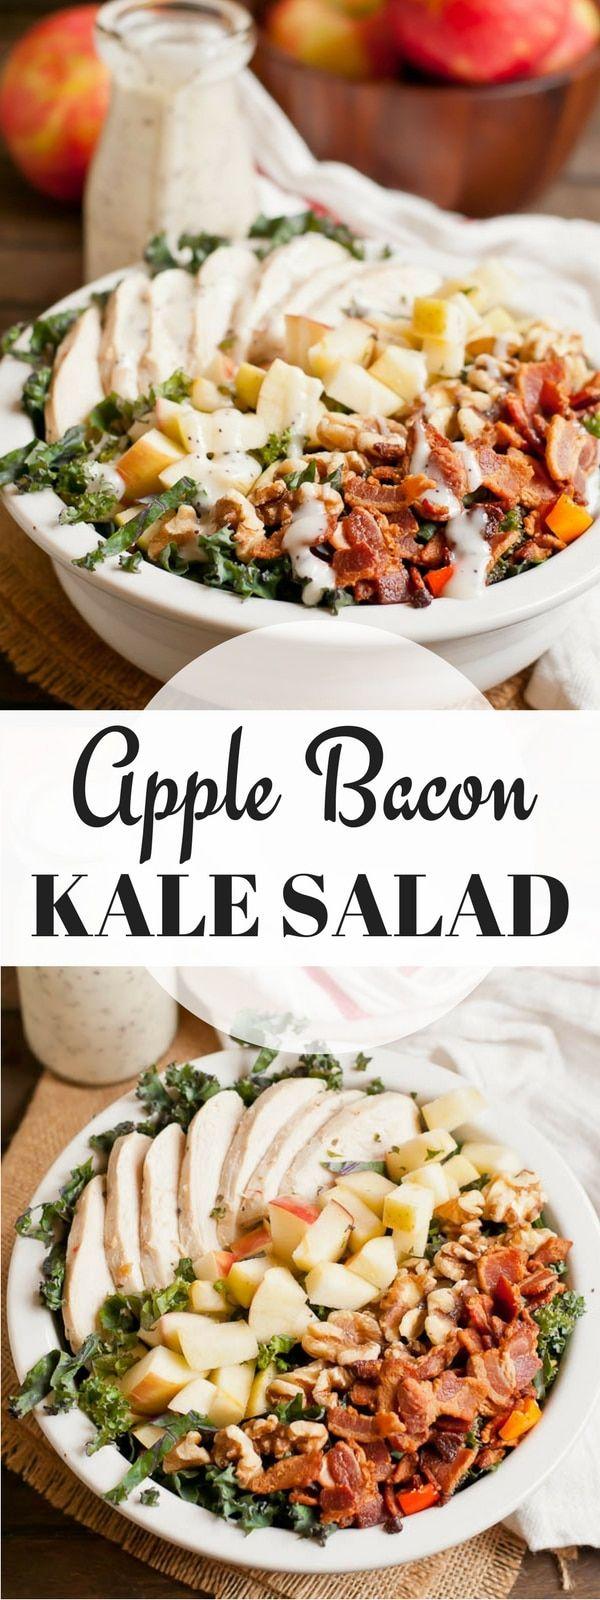 As 25 melhores ideias de Bacon kale no Pinterest ...